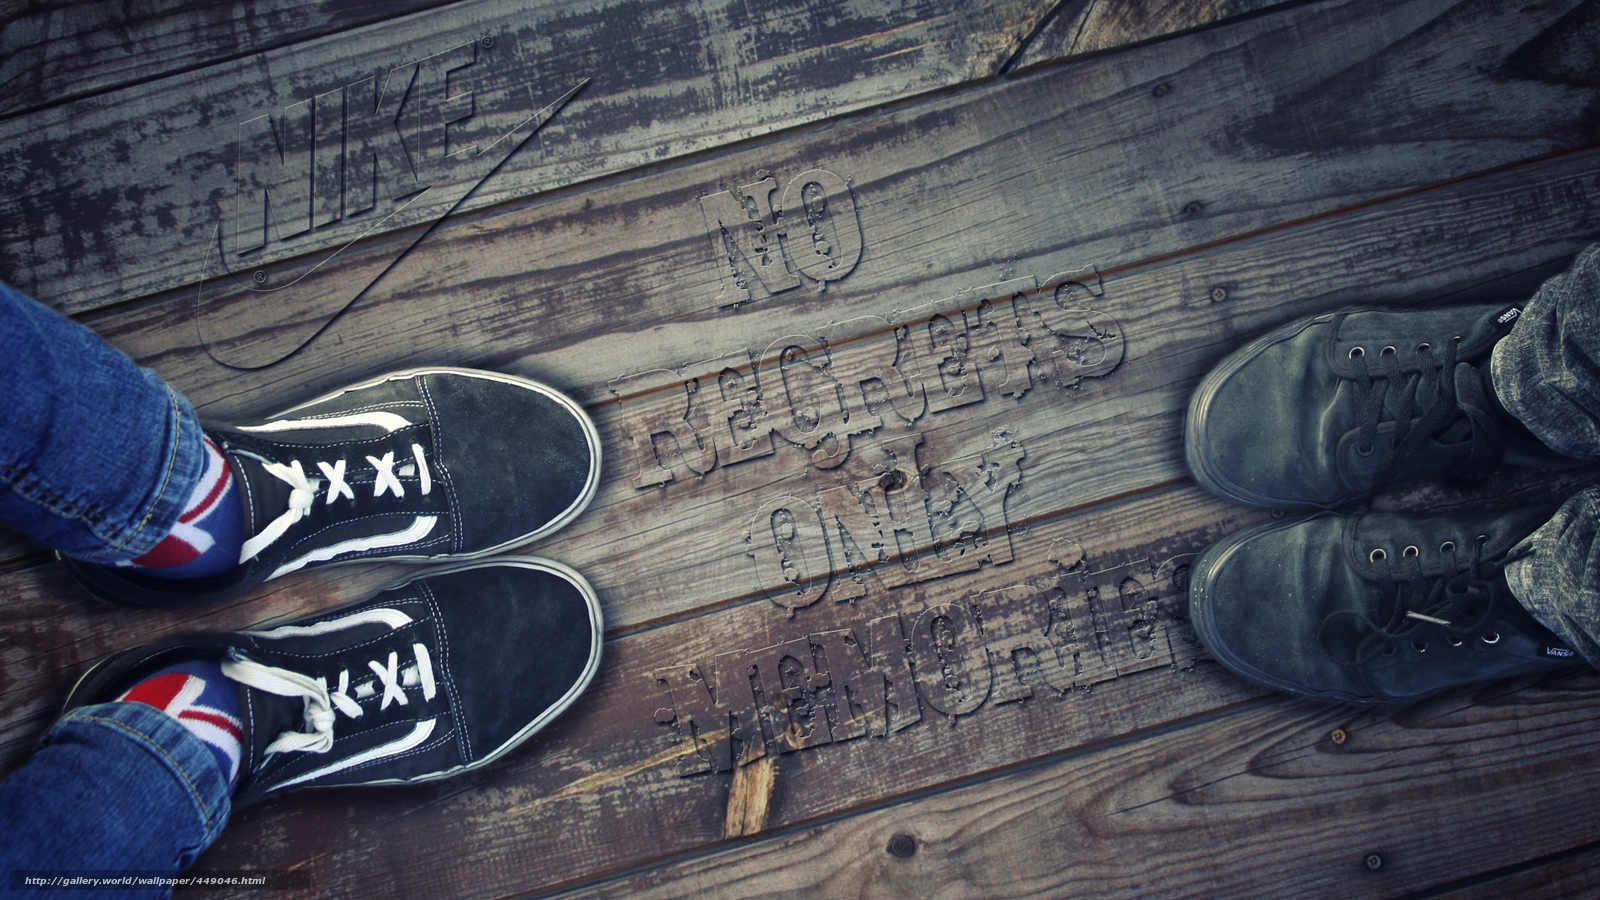 Tlcharger Fond D Ecran Chaussures De Tennis Jeans Nike